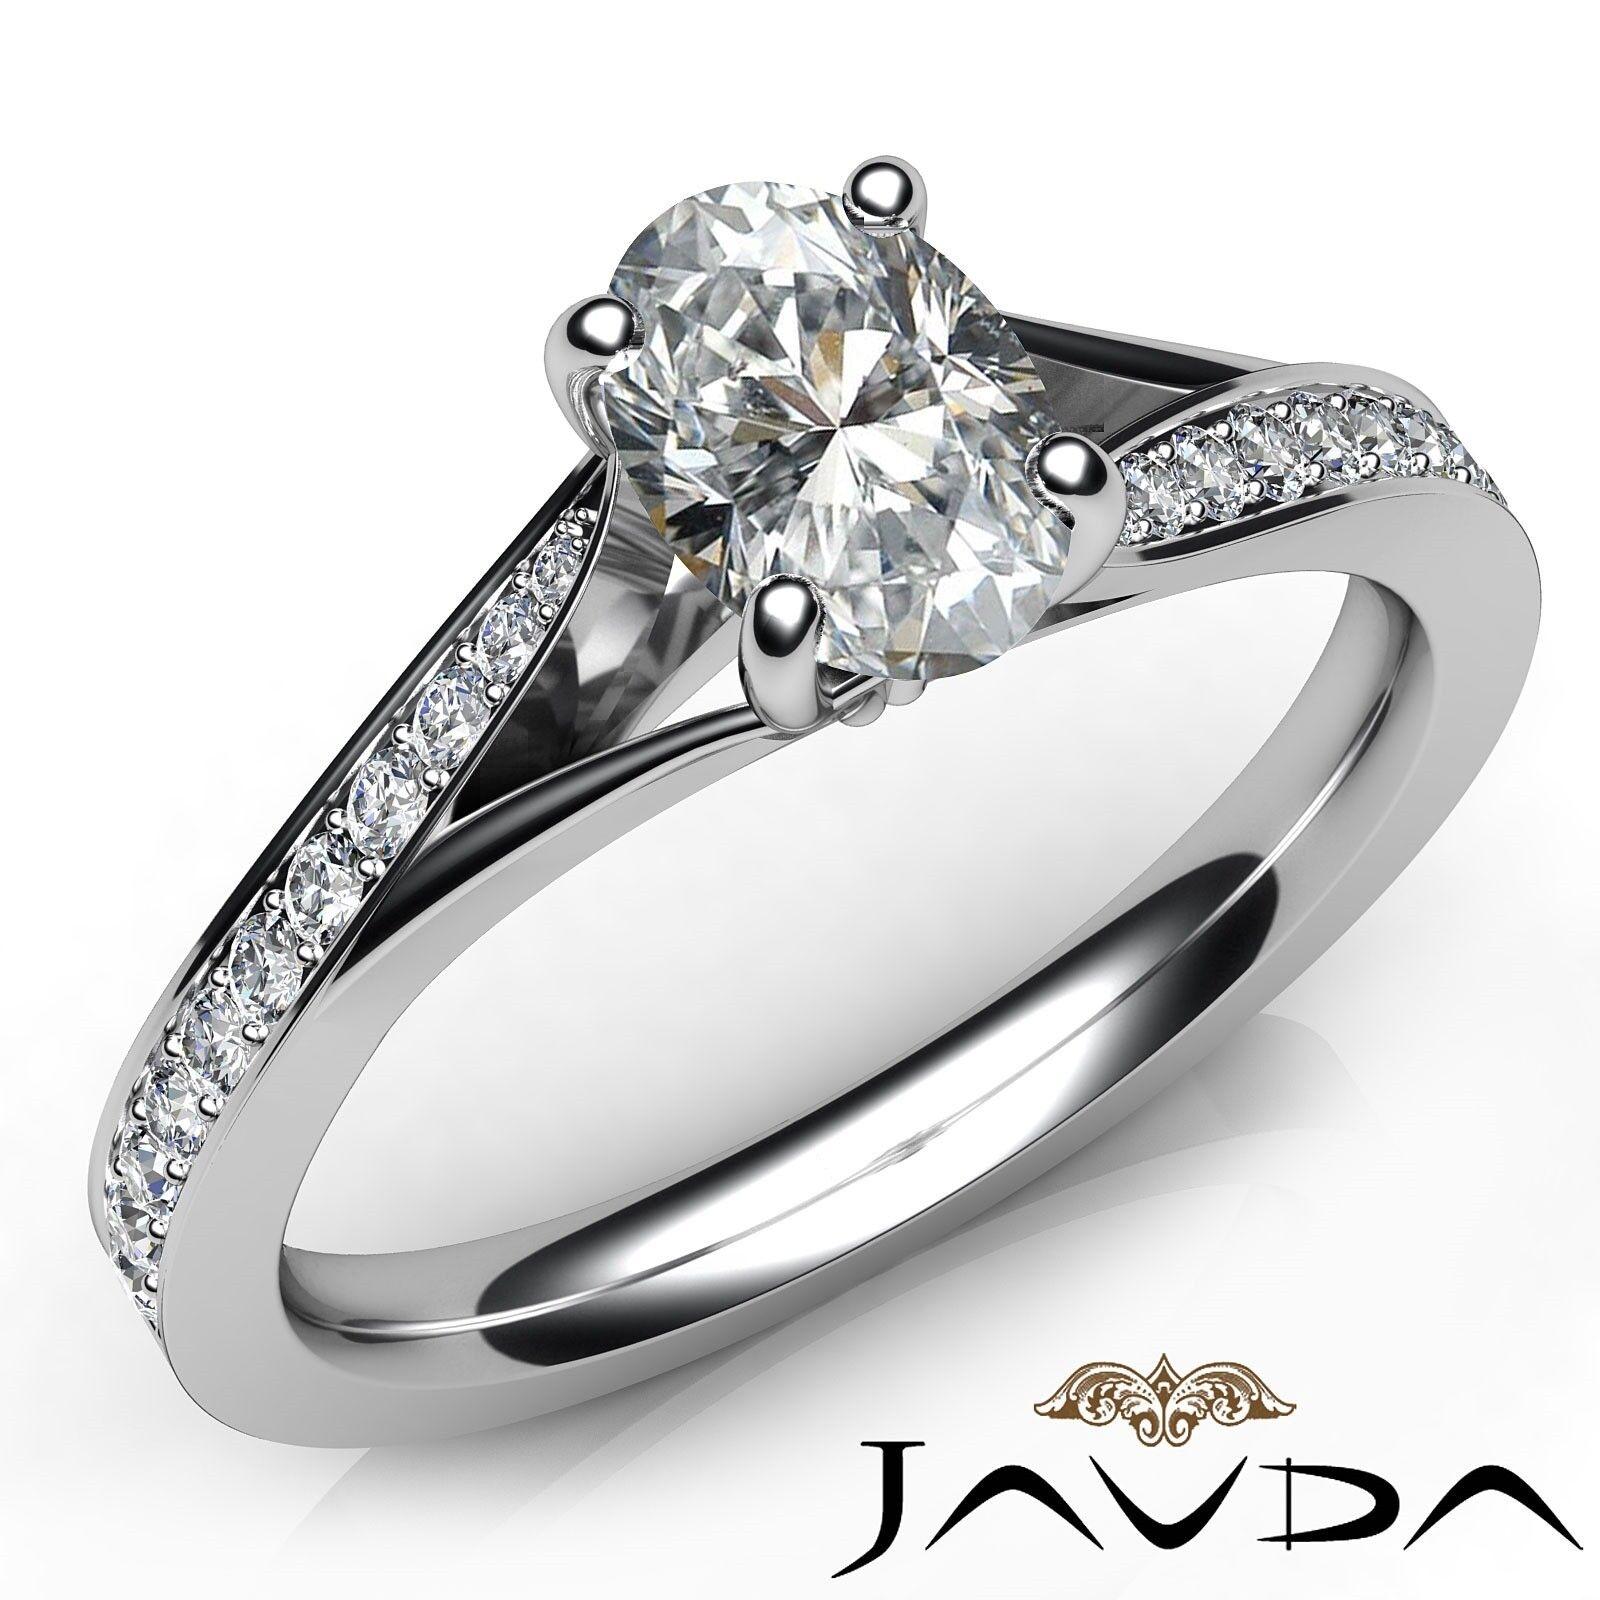 0.85ctw Knife Edge Oval Diamond Engagement Ring GIA F-VVS2 White Gold Women New